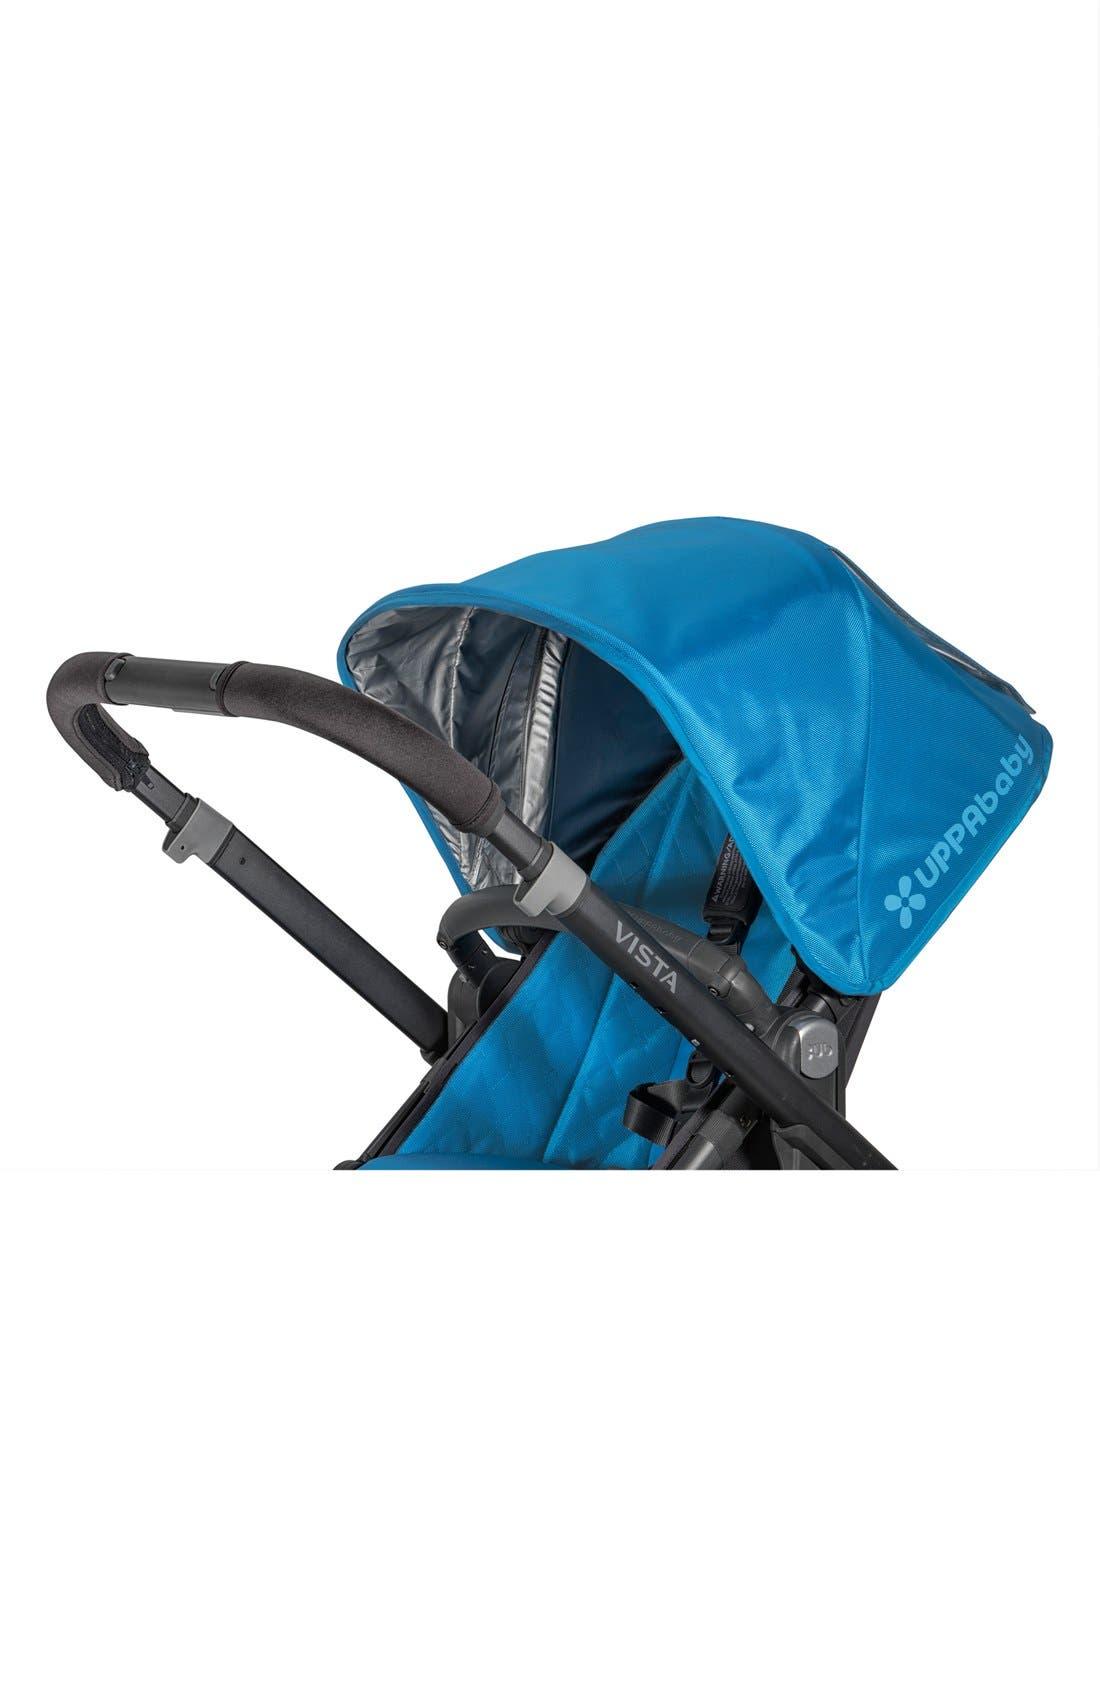 Main Image - UPPAbaby VISTA® Stroller Handlebar Cover